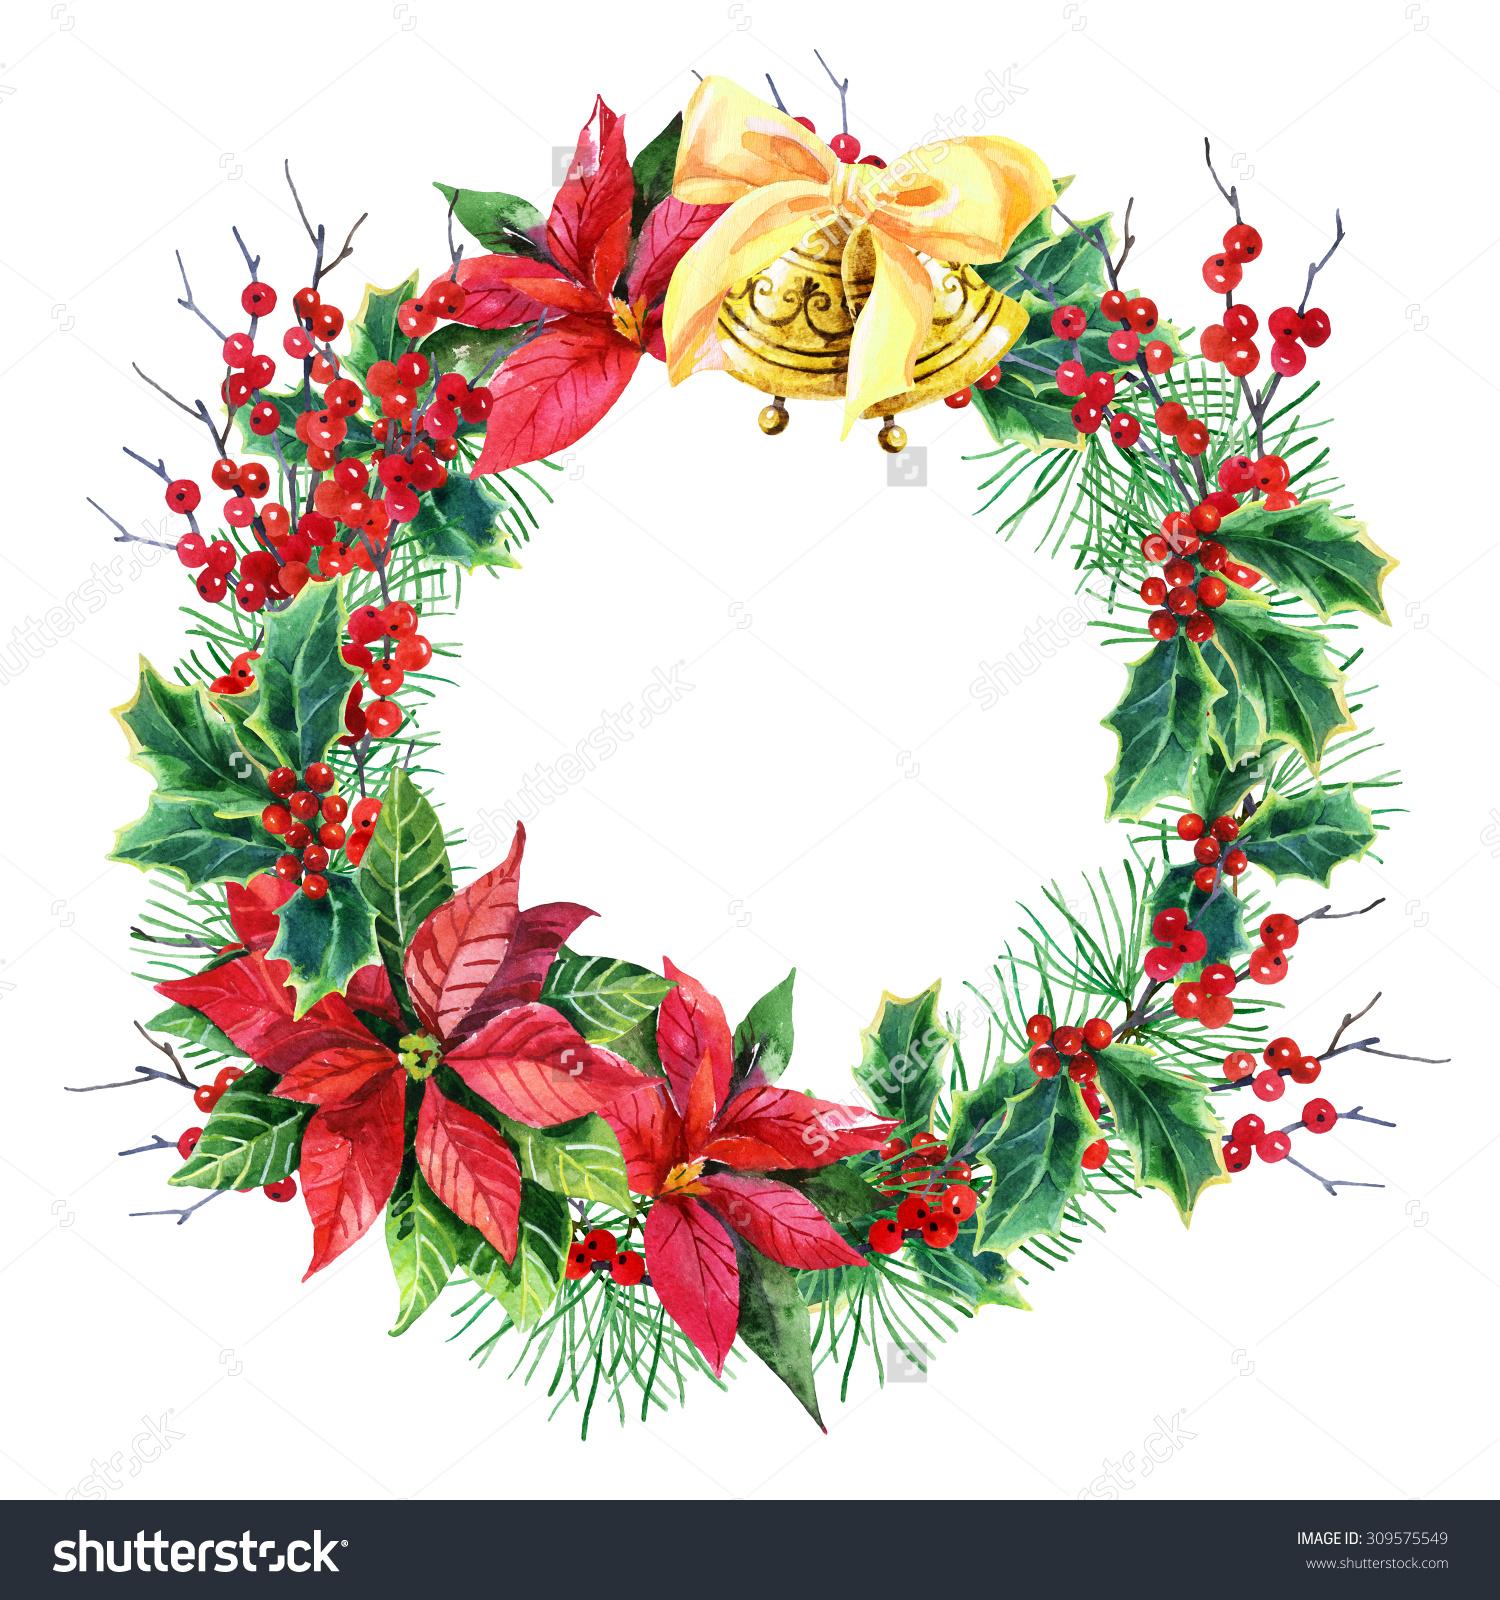 Poinsettia clipart christmas tree branches With poinsettia photo christmas pine